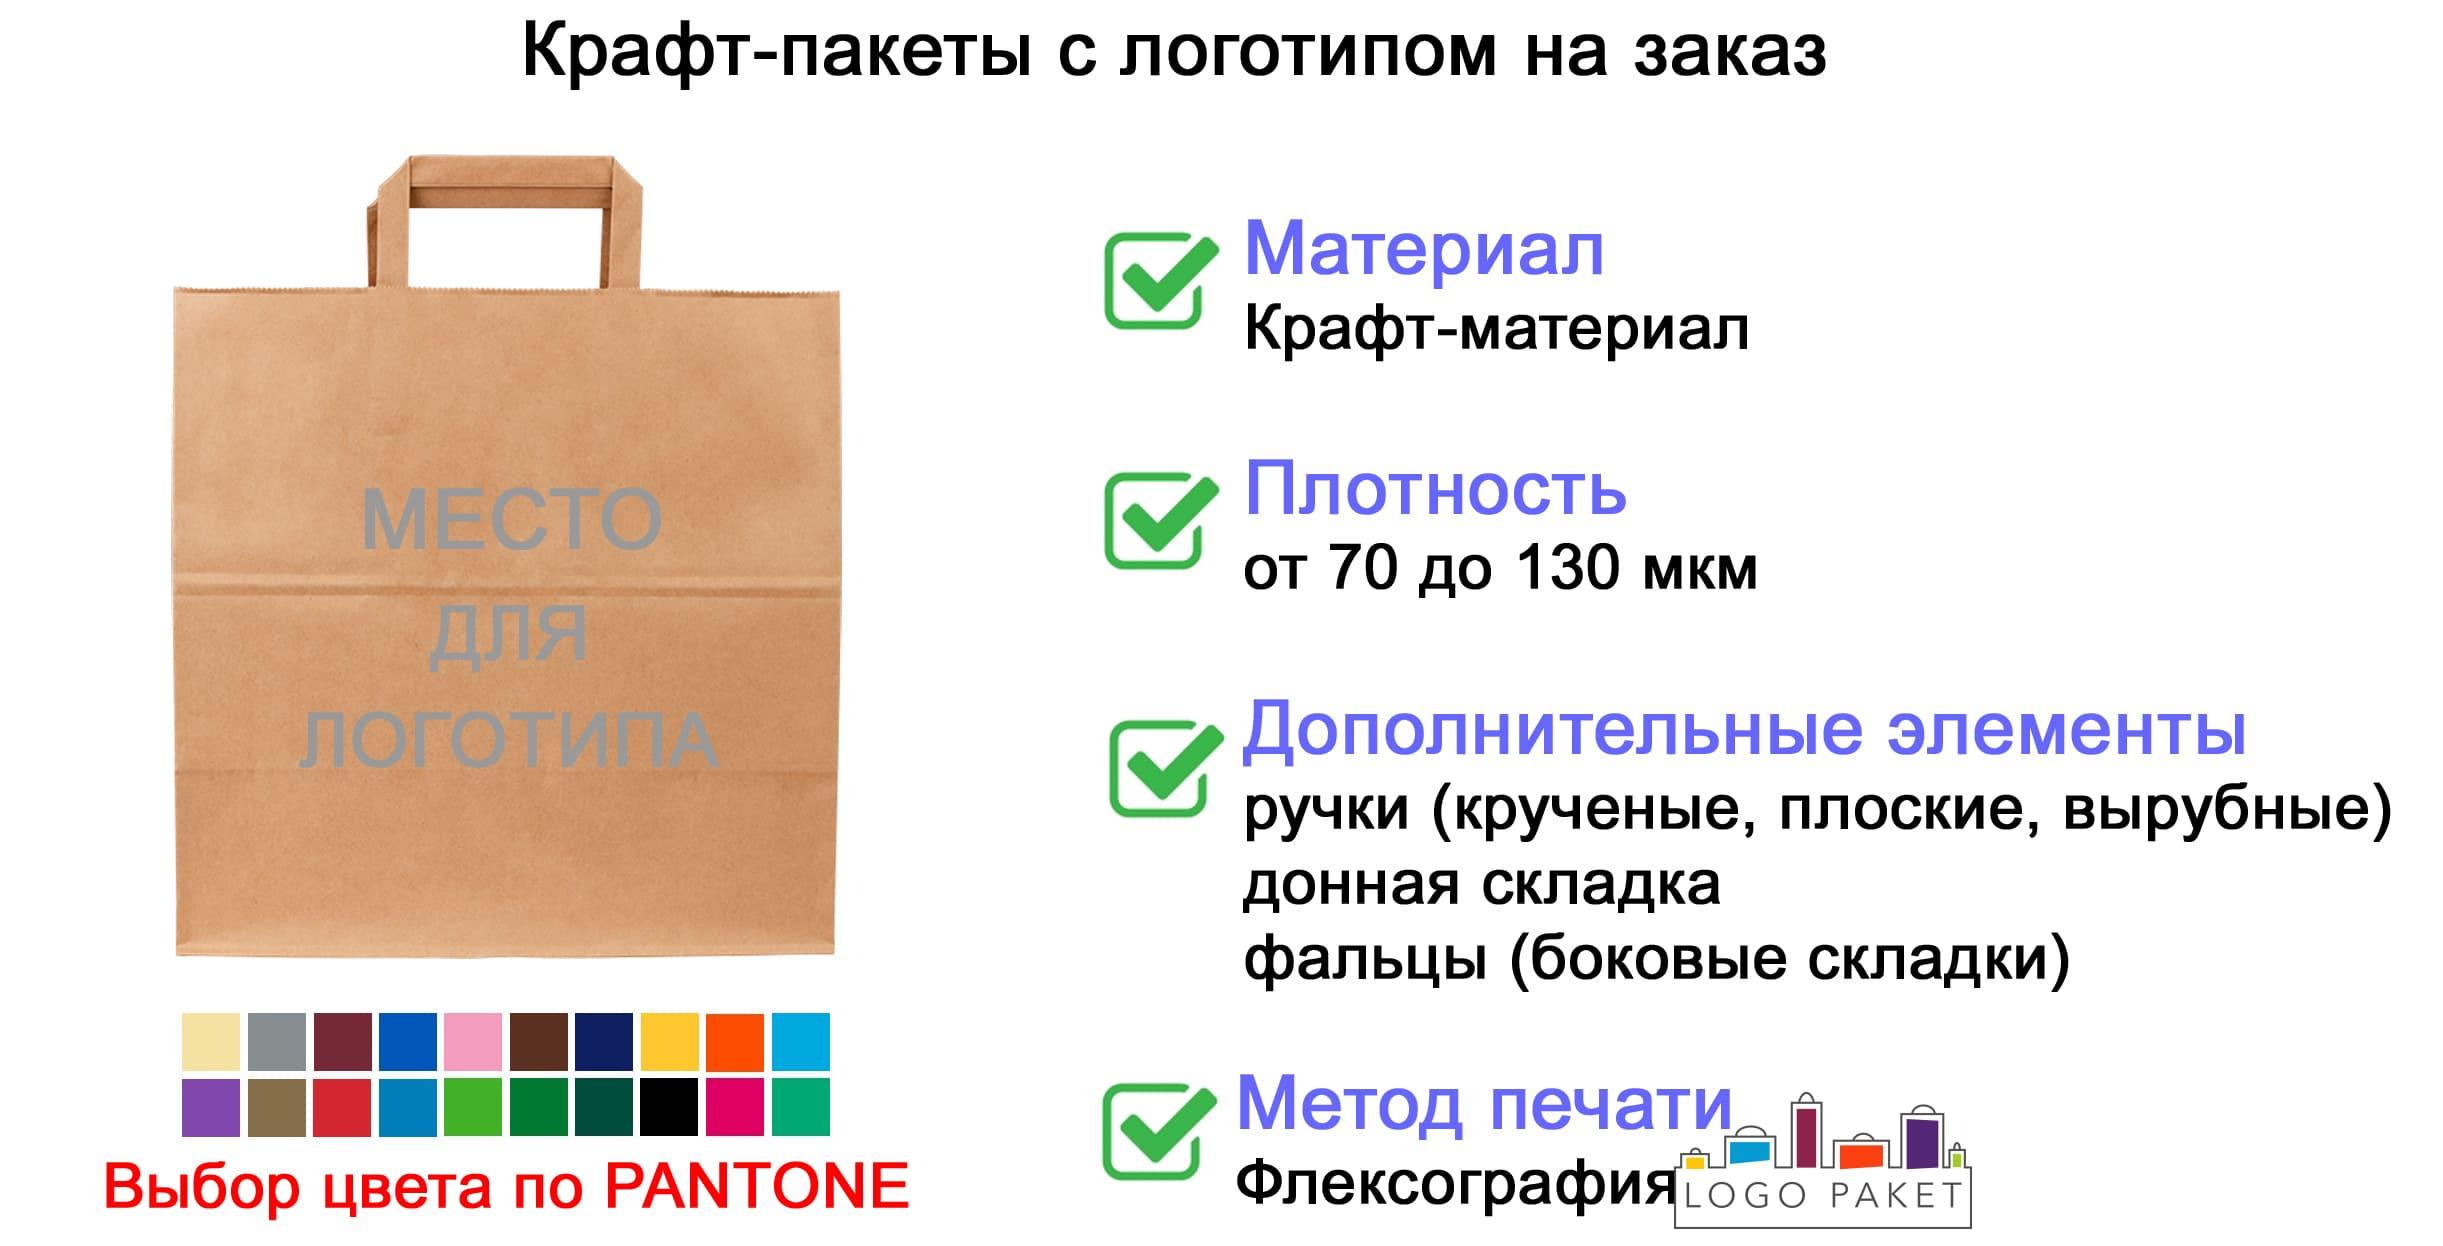 Крафт-пакеты с логотипом инфографика